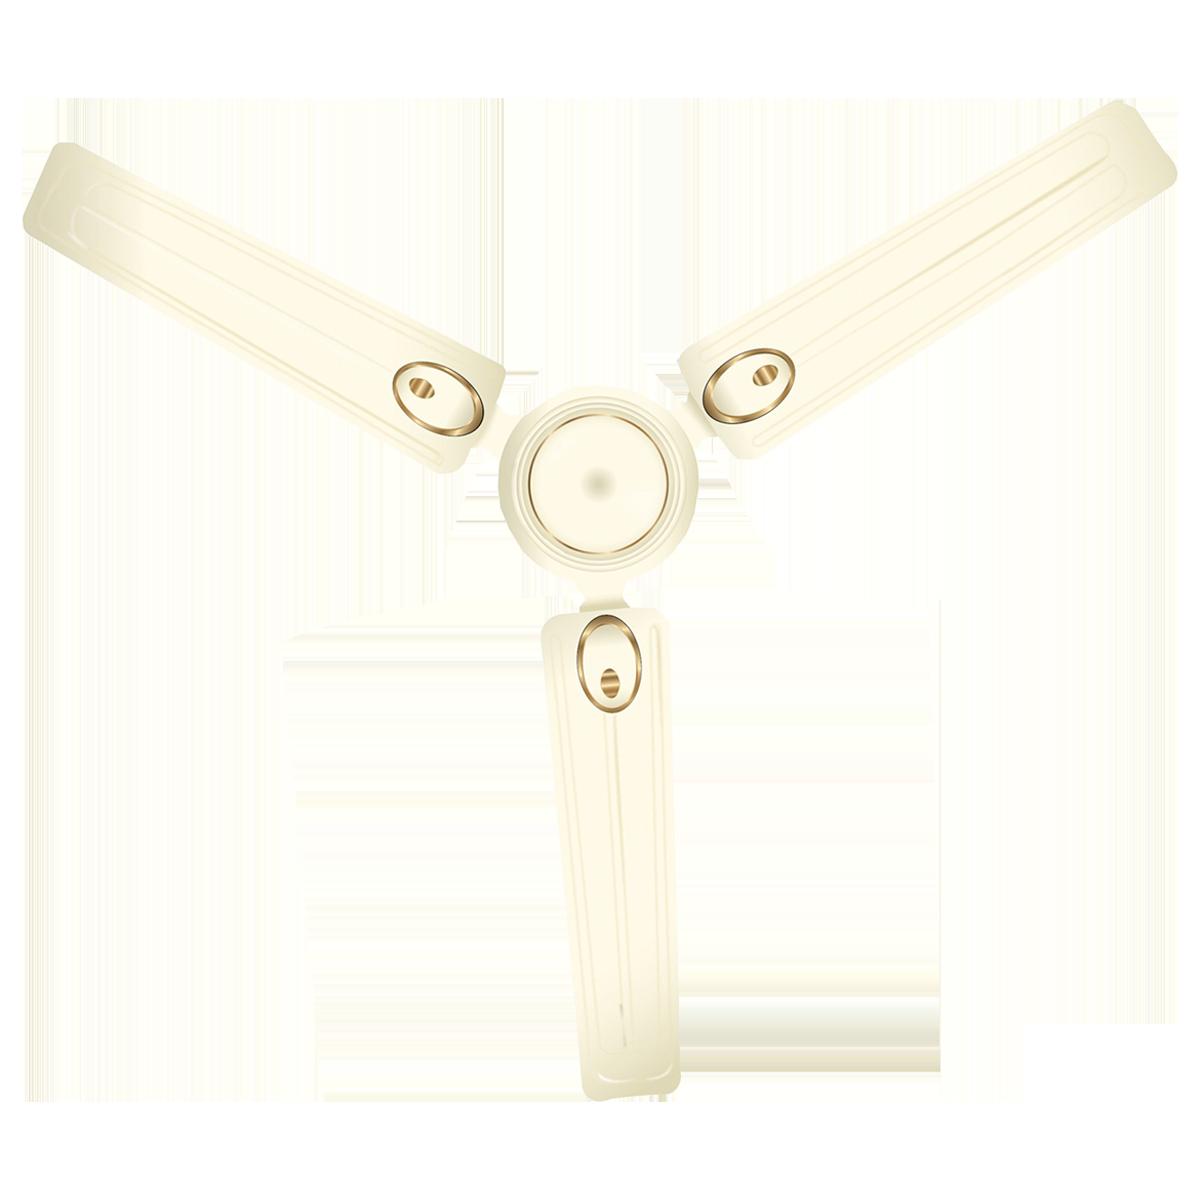 Lifelong 120cm Sweep 3 Blades Ceiling Fan (Efficient Copper Motor, LLCF302, Ivory)_1